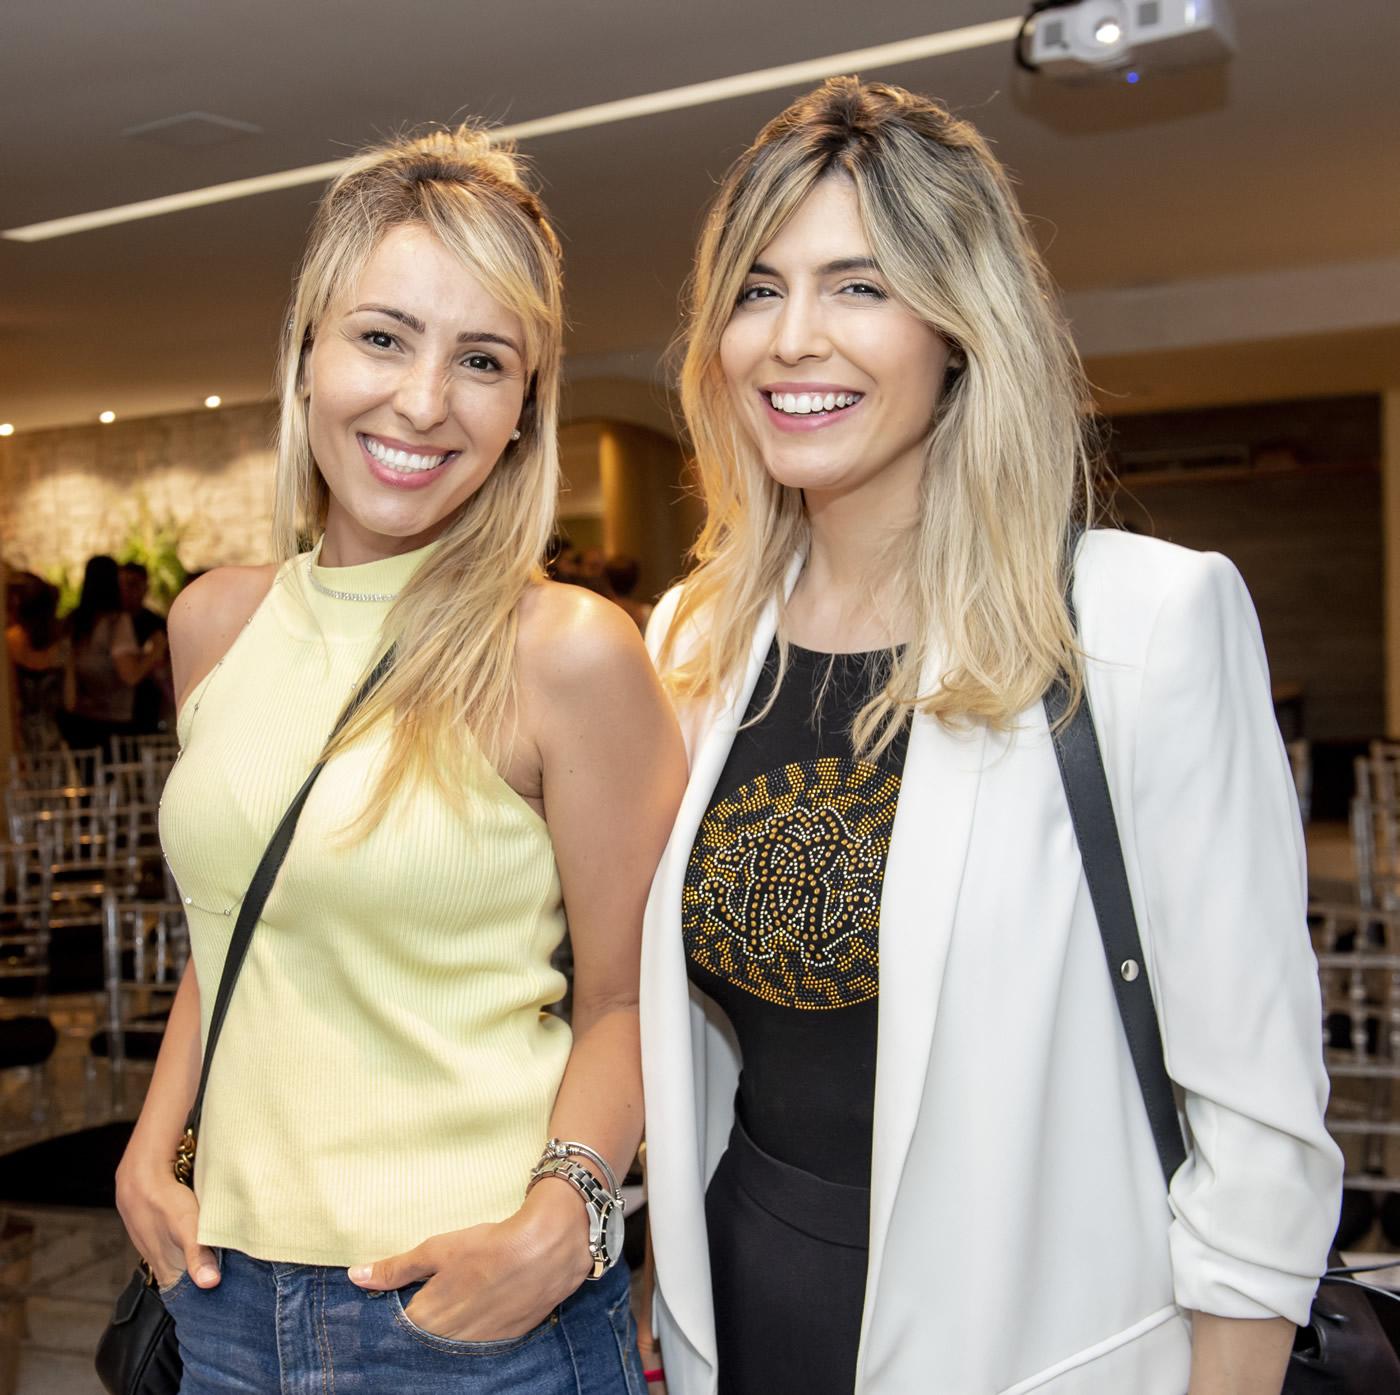 Bethania Rocha e Aline Celles